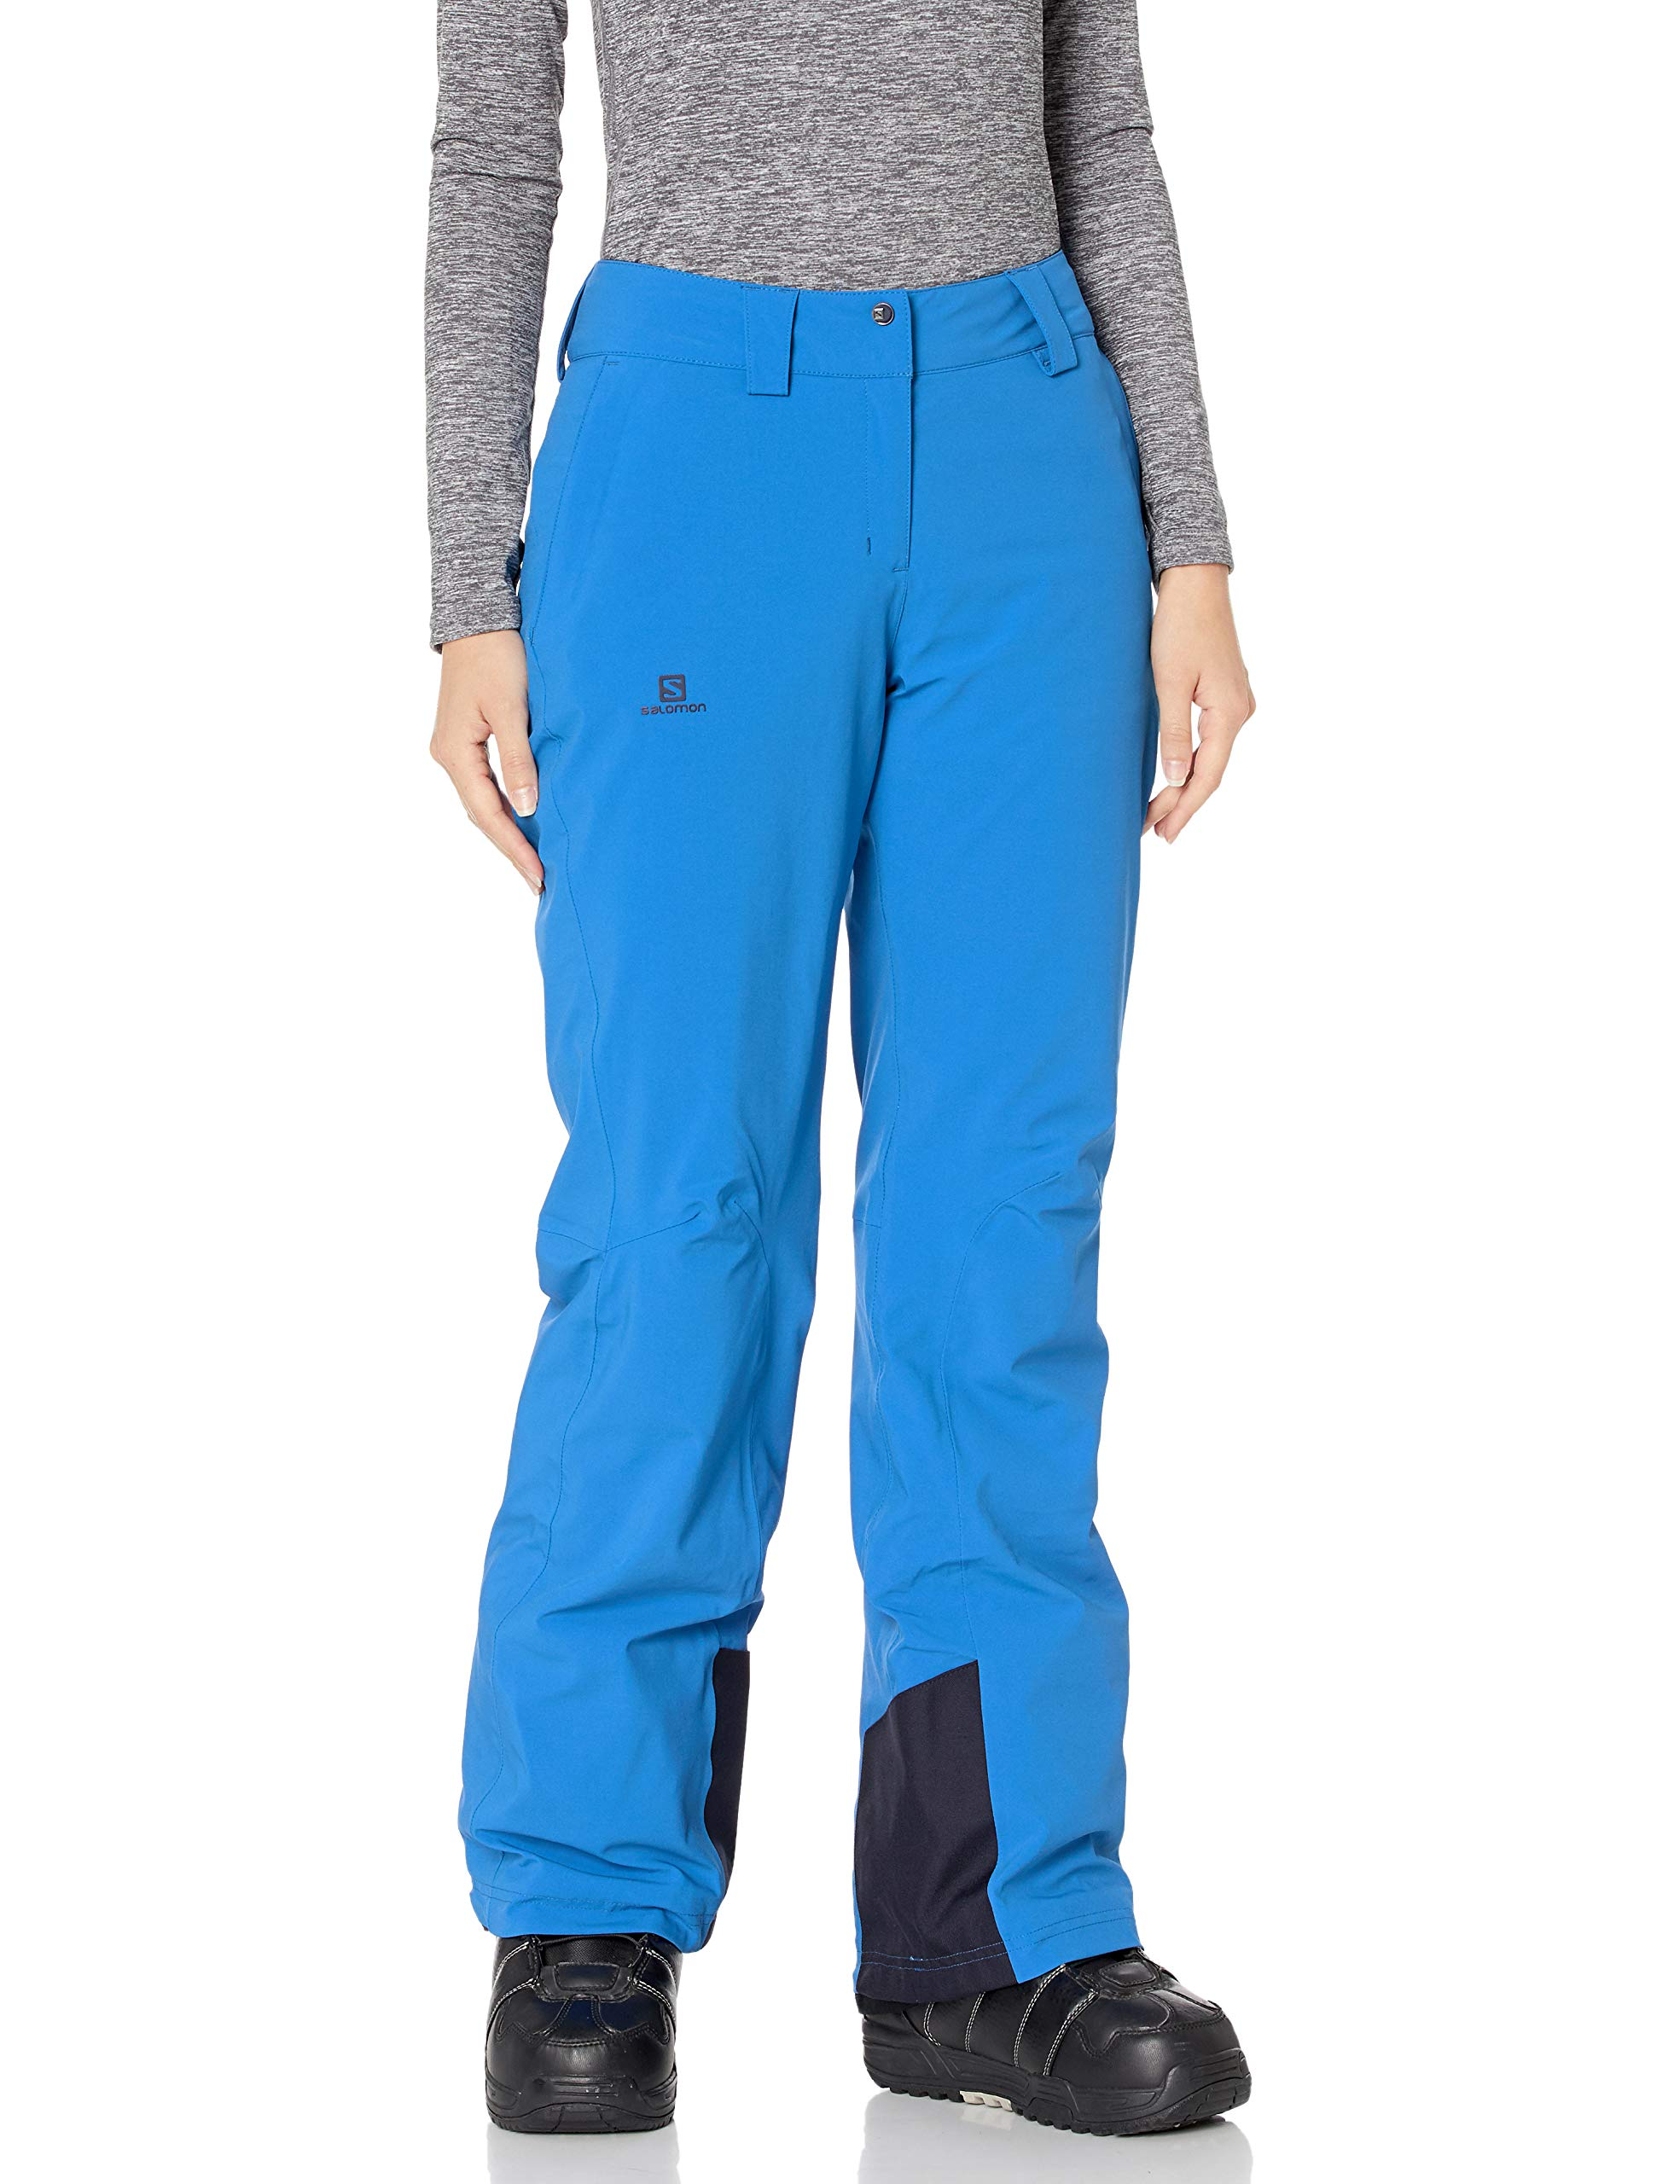 Salomon Women's Icemania Pants